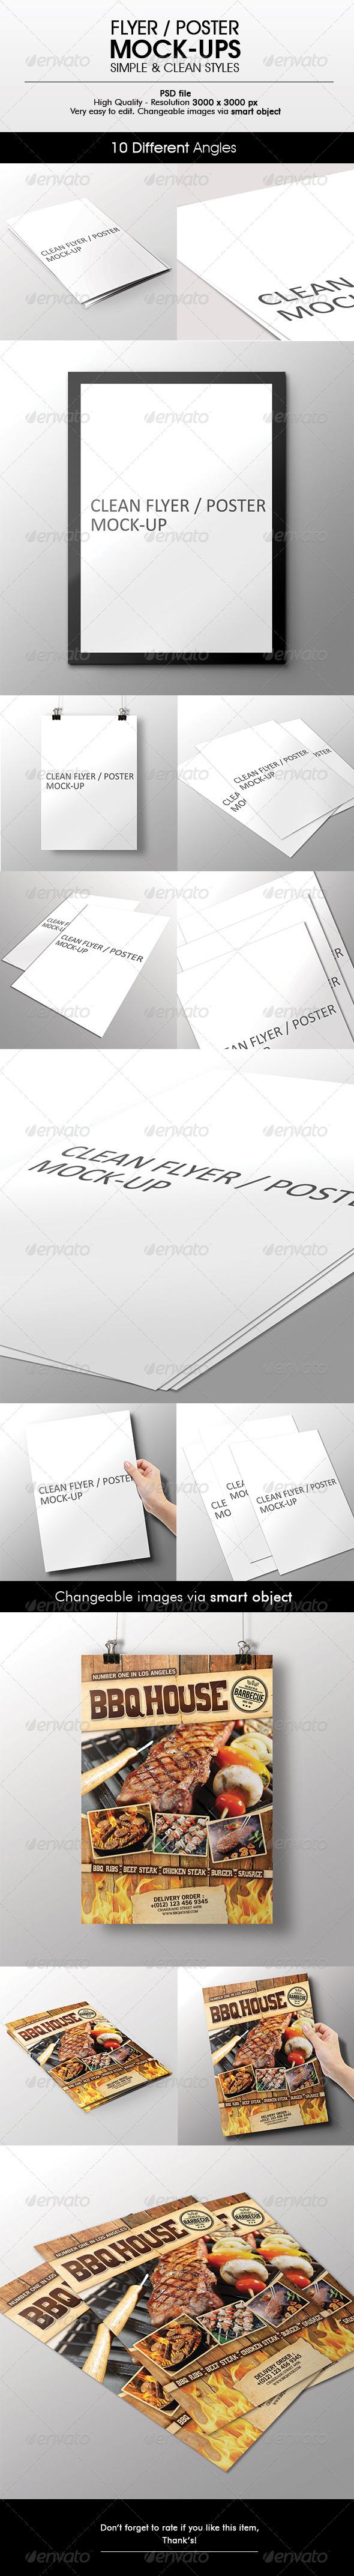 Flyer / Poster Mock-Up - Flyers Print